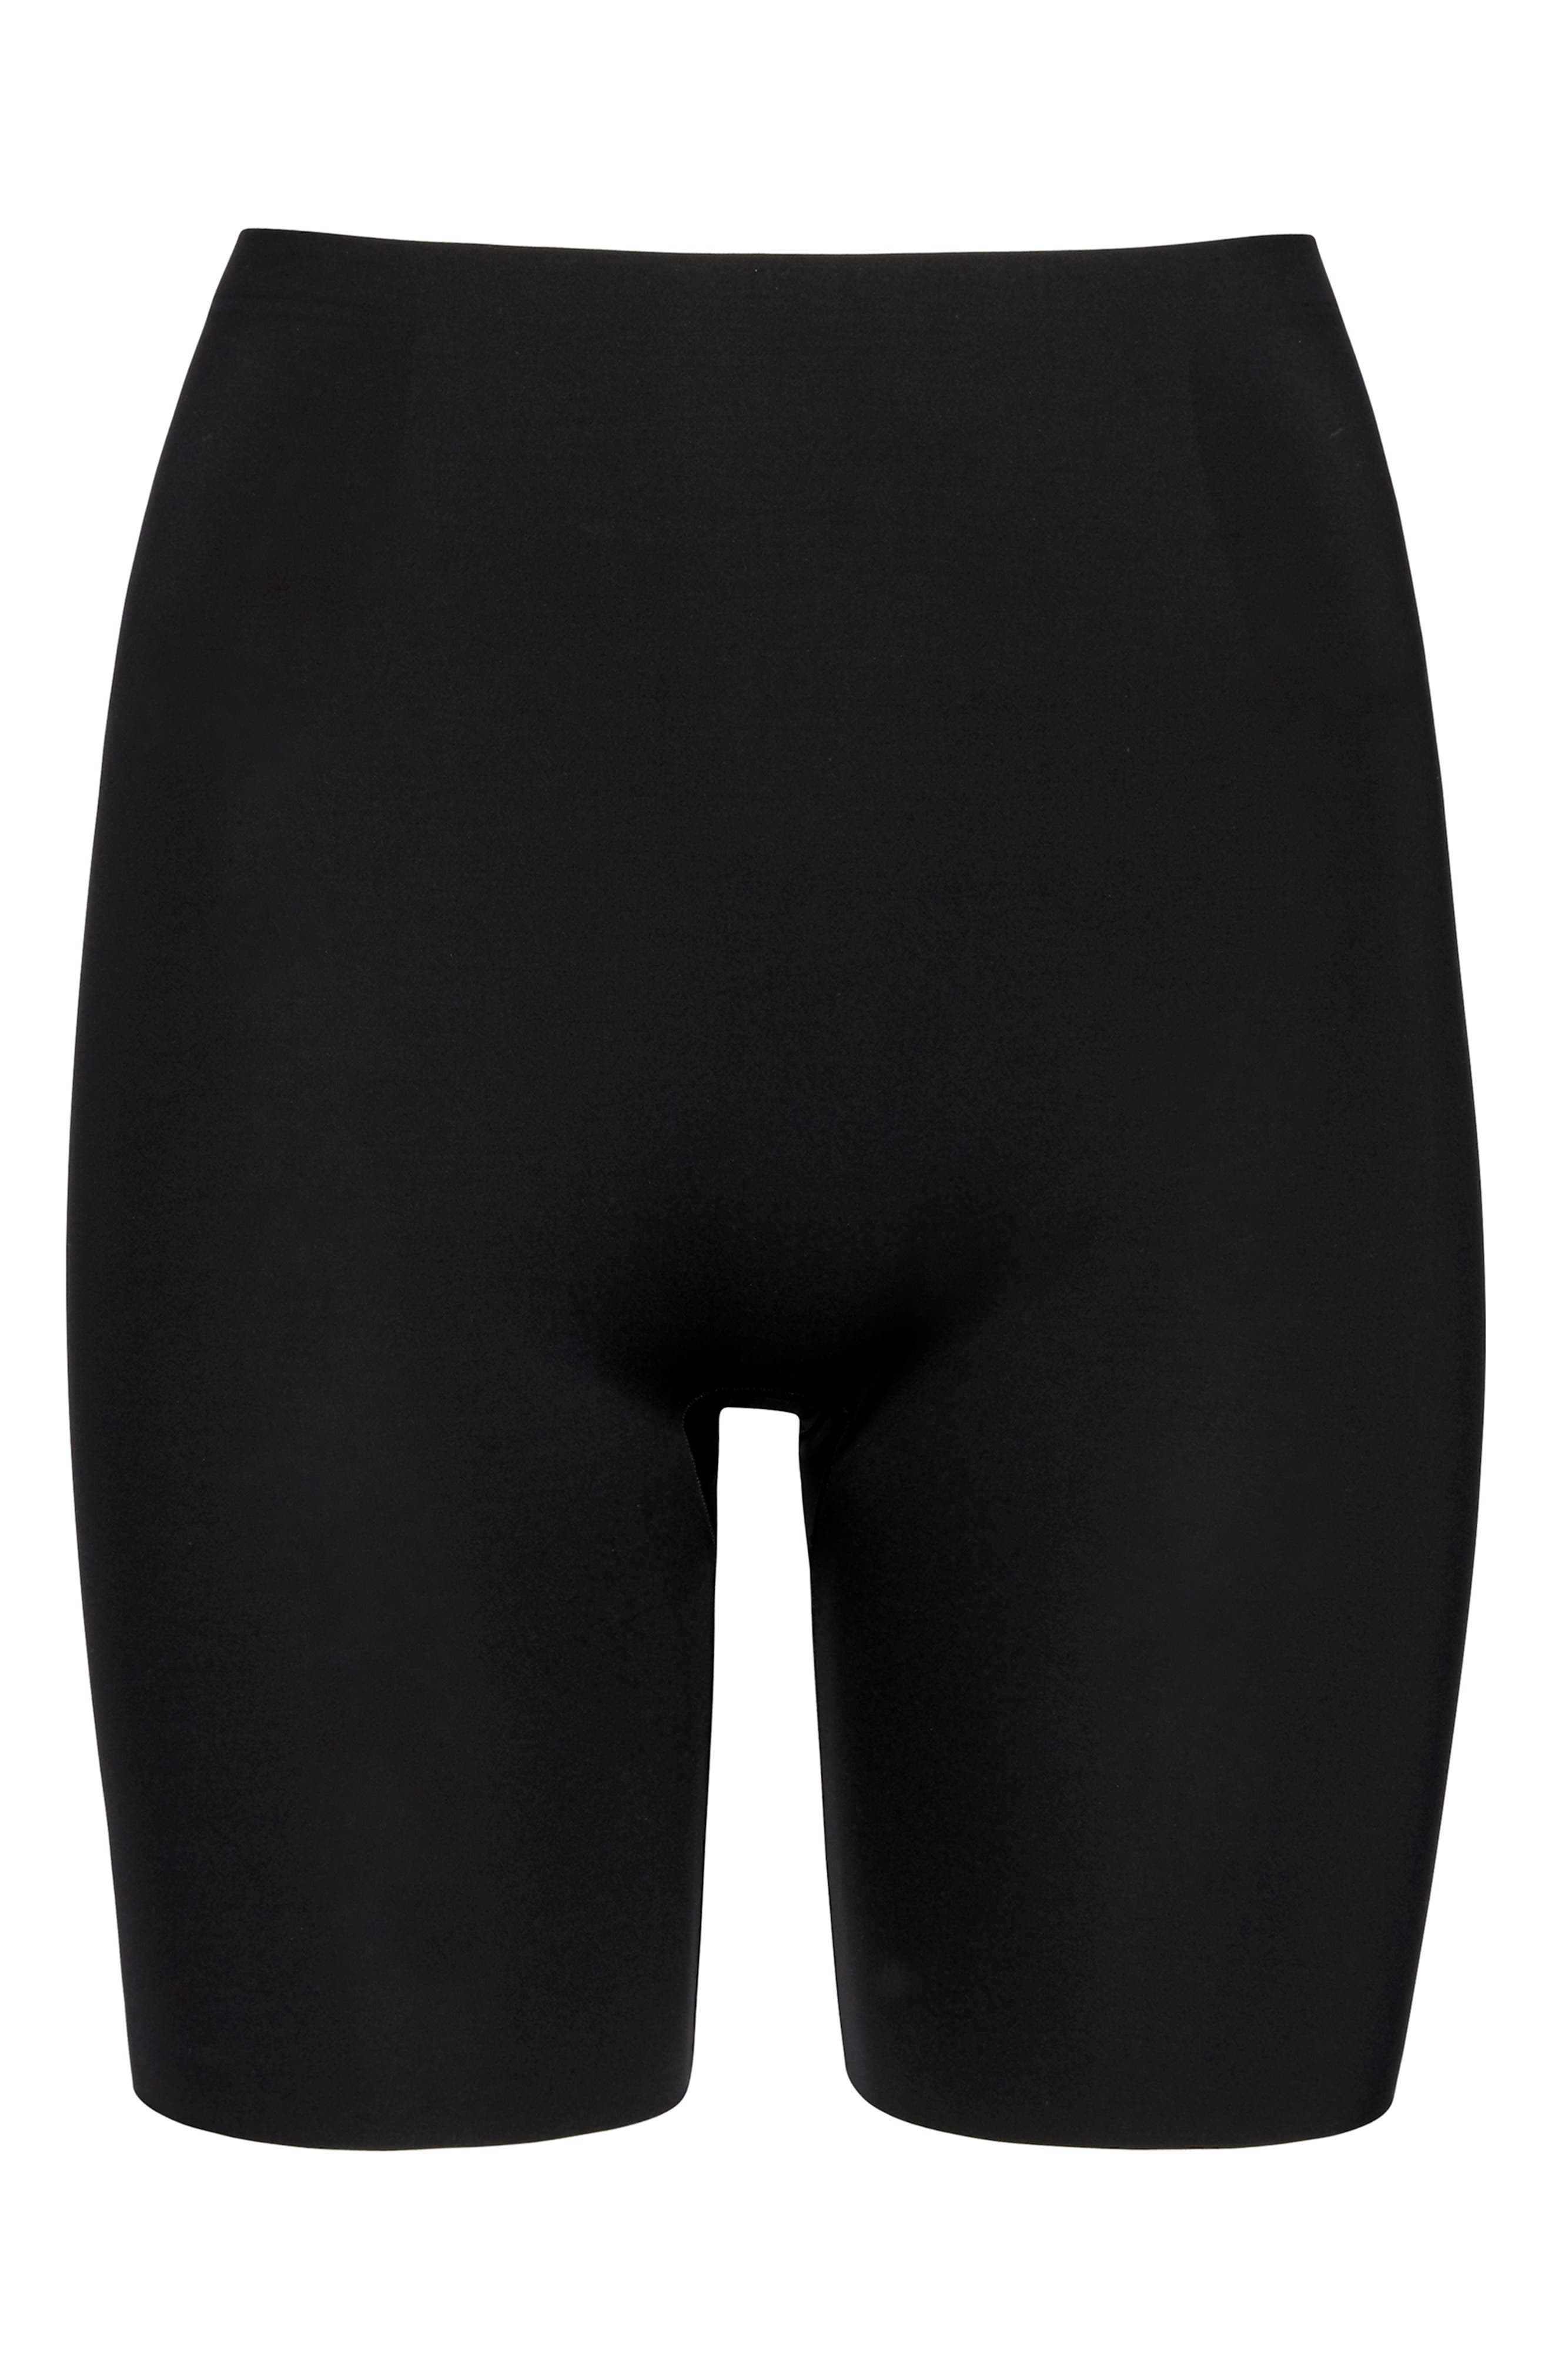 Thinstincts Mid Thigh Shorts,                             Main thumbnail 1, color,                             VERY BLACK